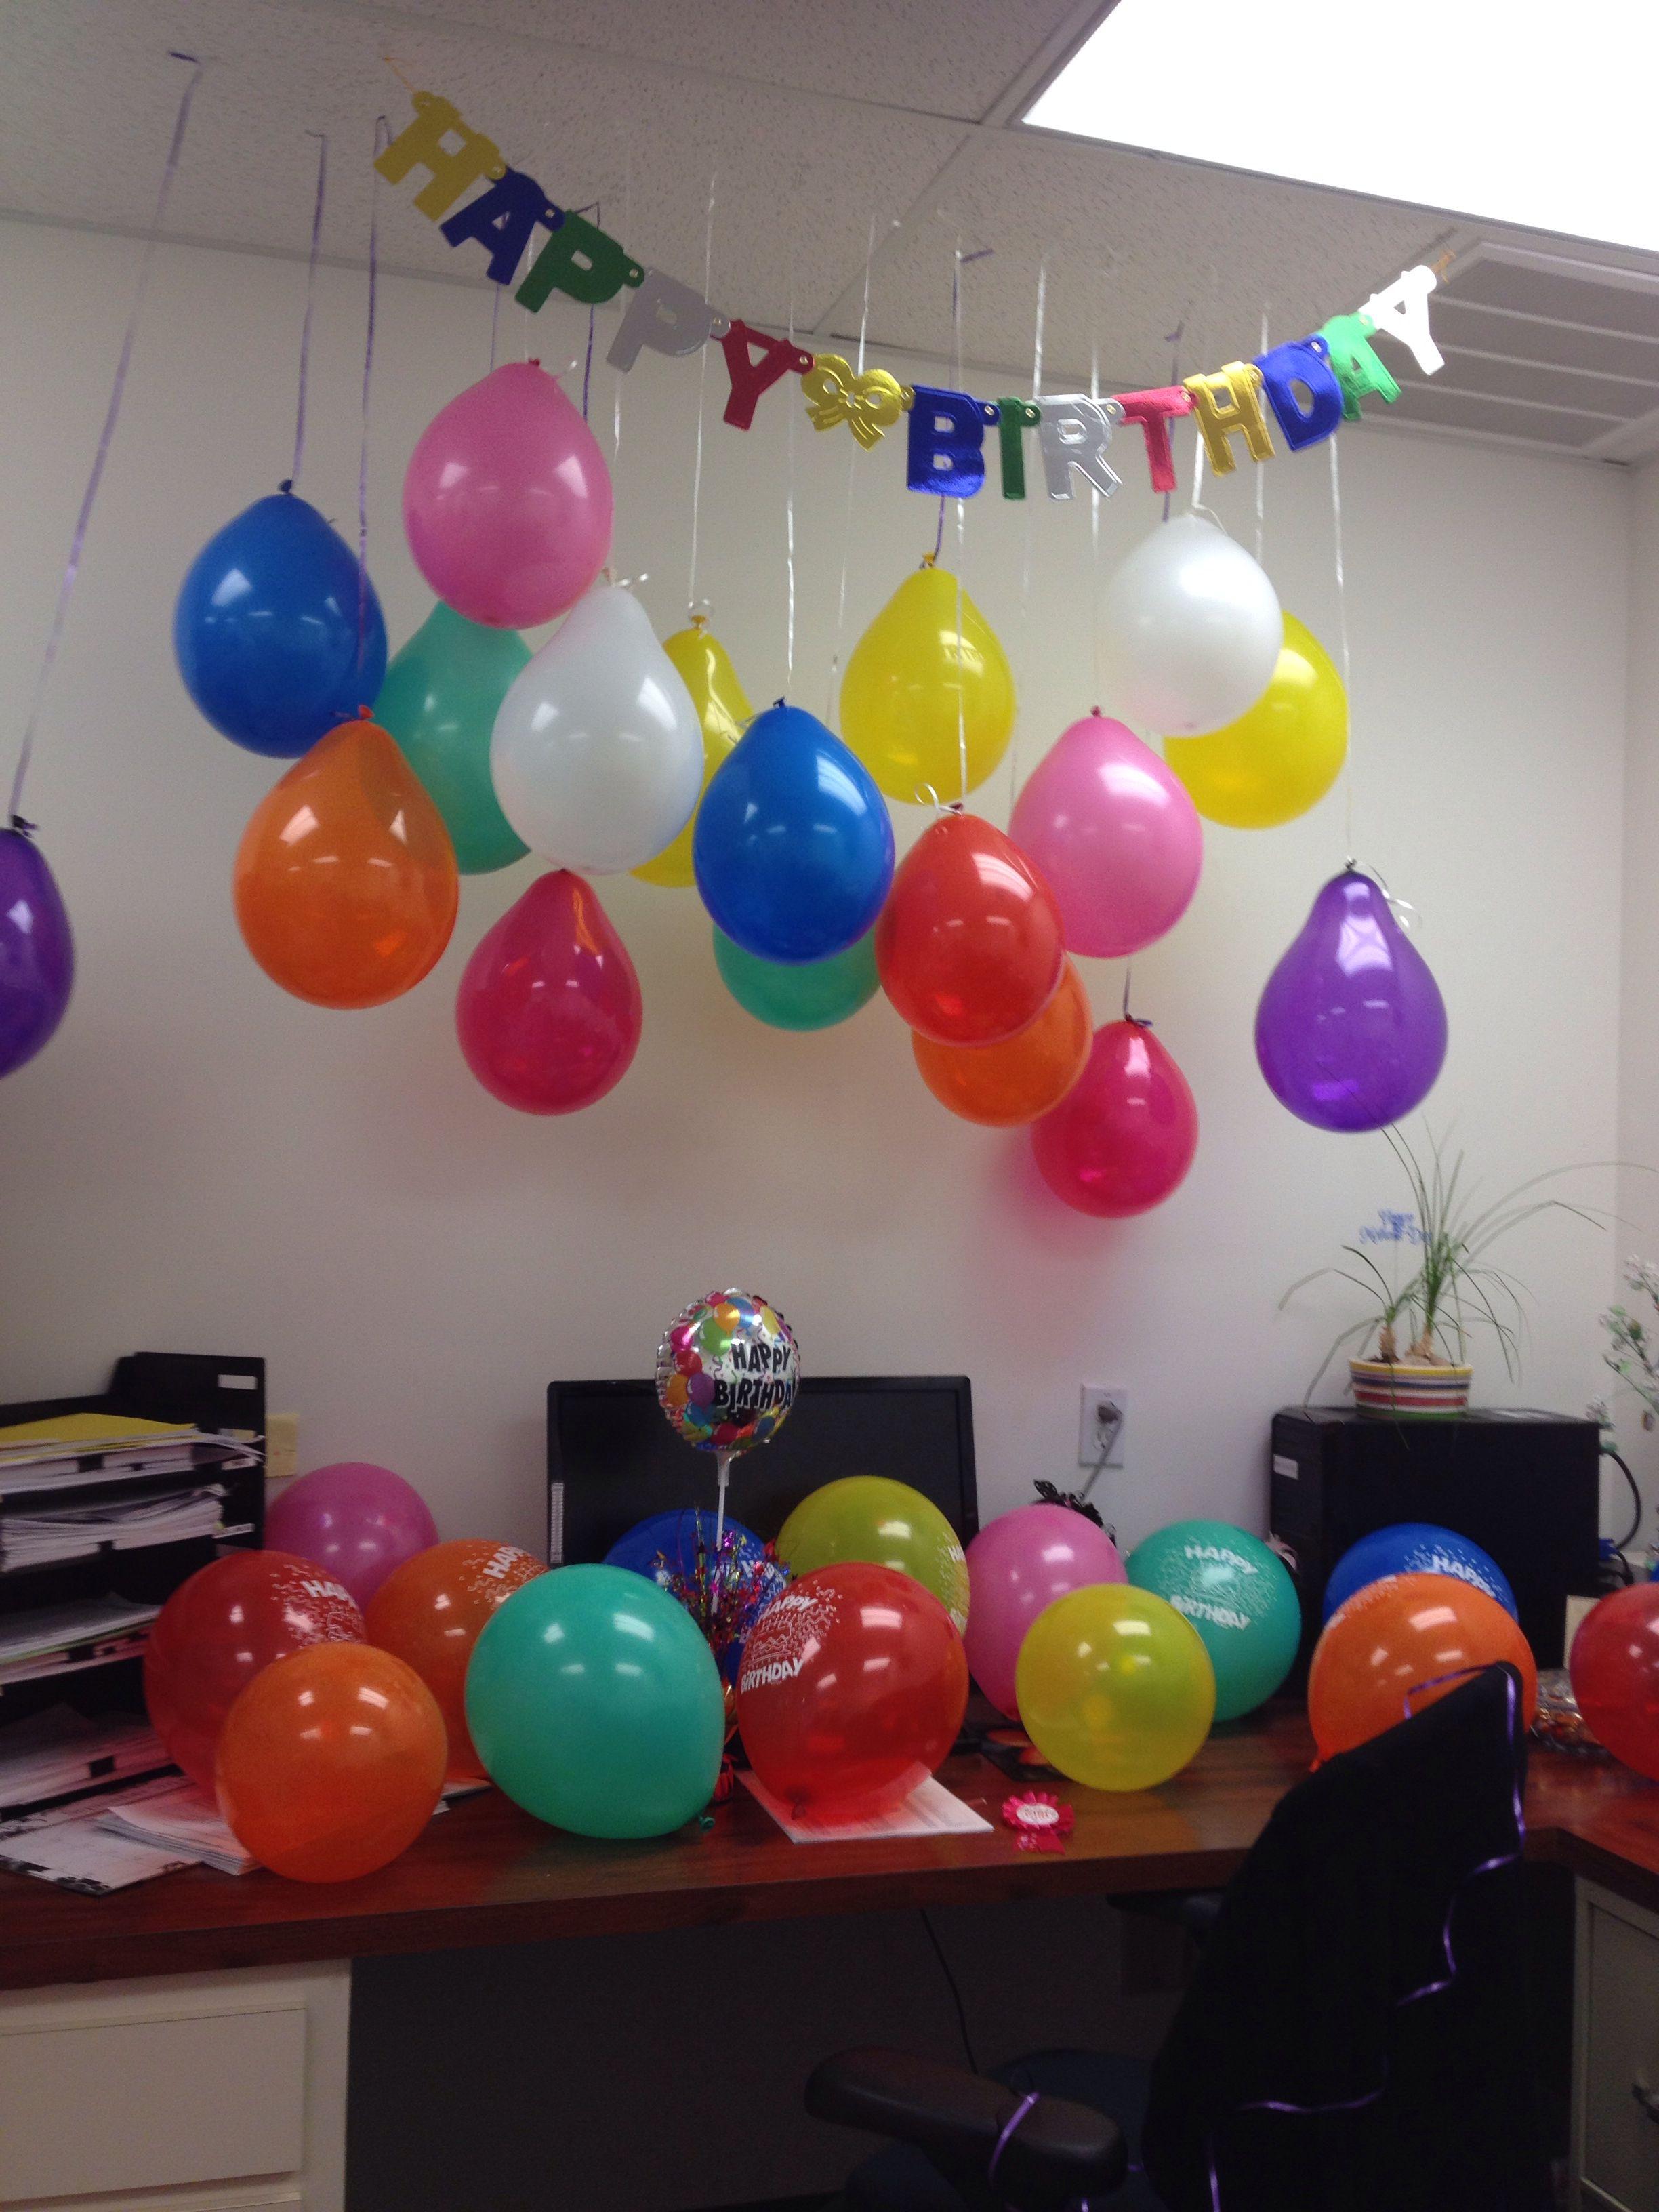 office birthday decorations Birthday decoration for an office | Creativity/Art | Office birthday, Office birthday